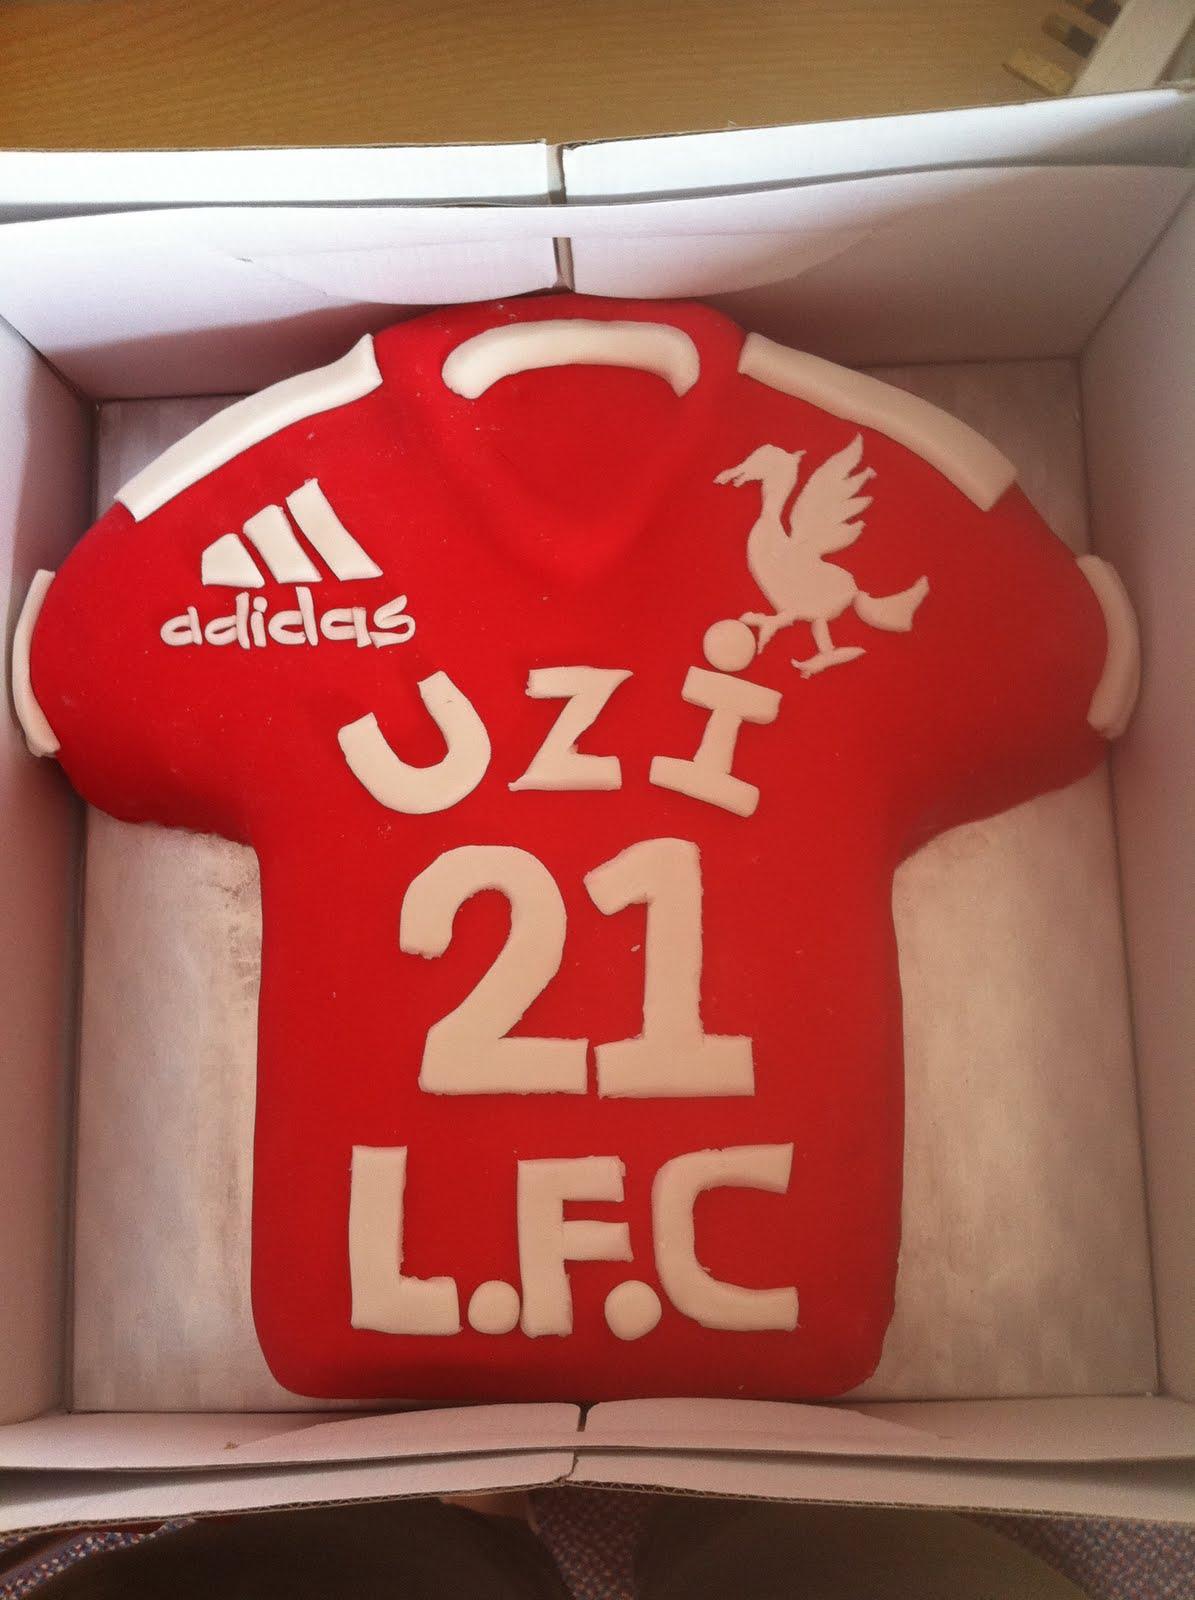 the bjorn adventures liverpool fc 21st birthday cake the bjorn adventures liverpool fc 21st birthday cake